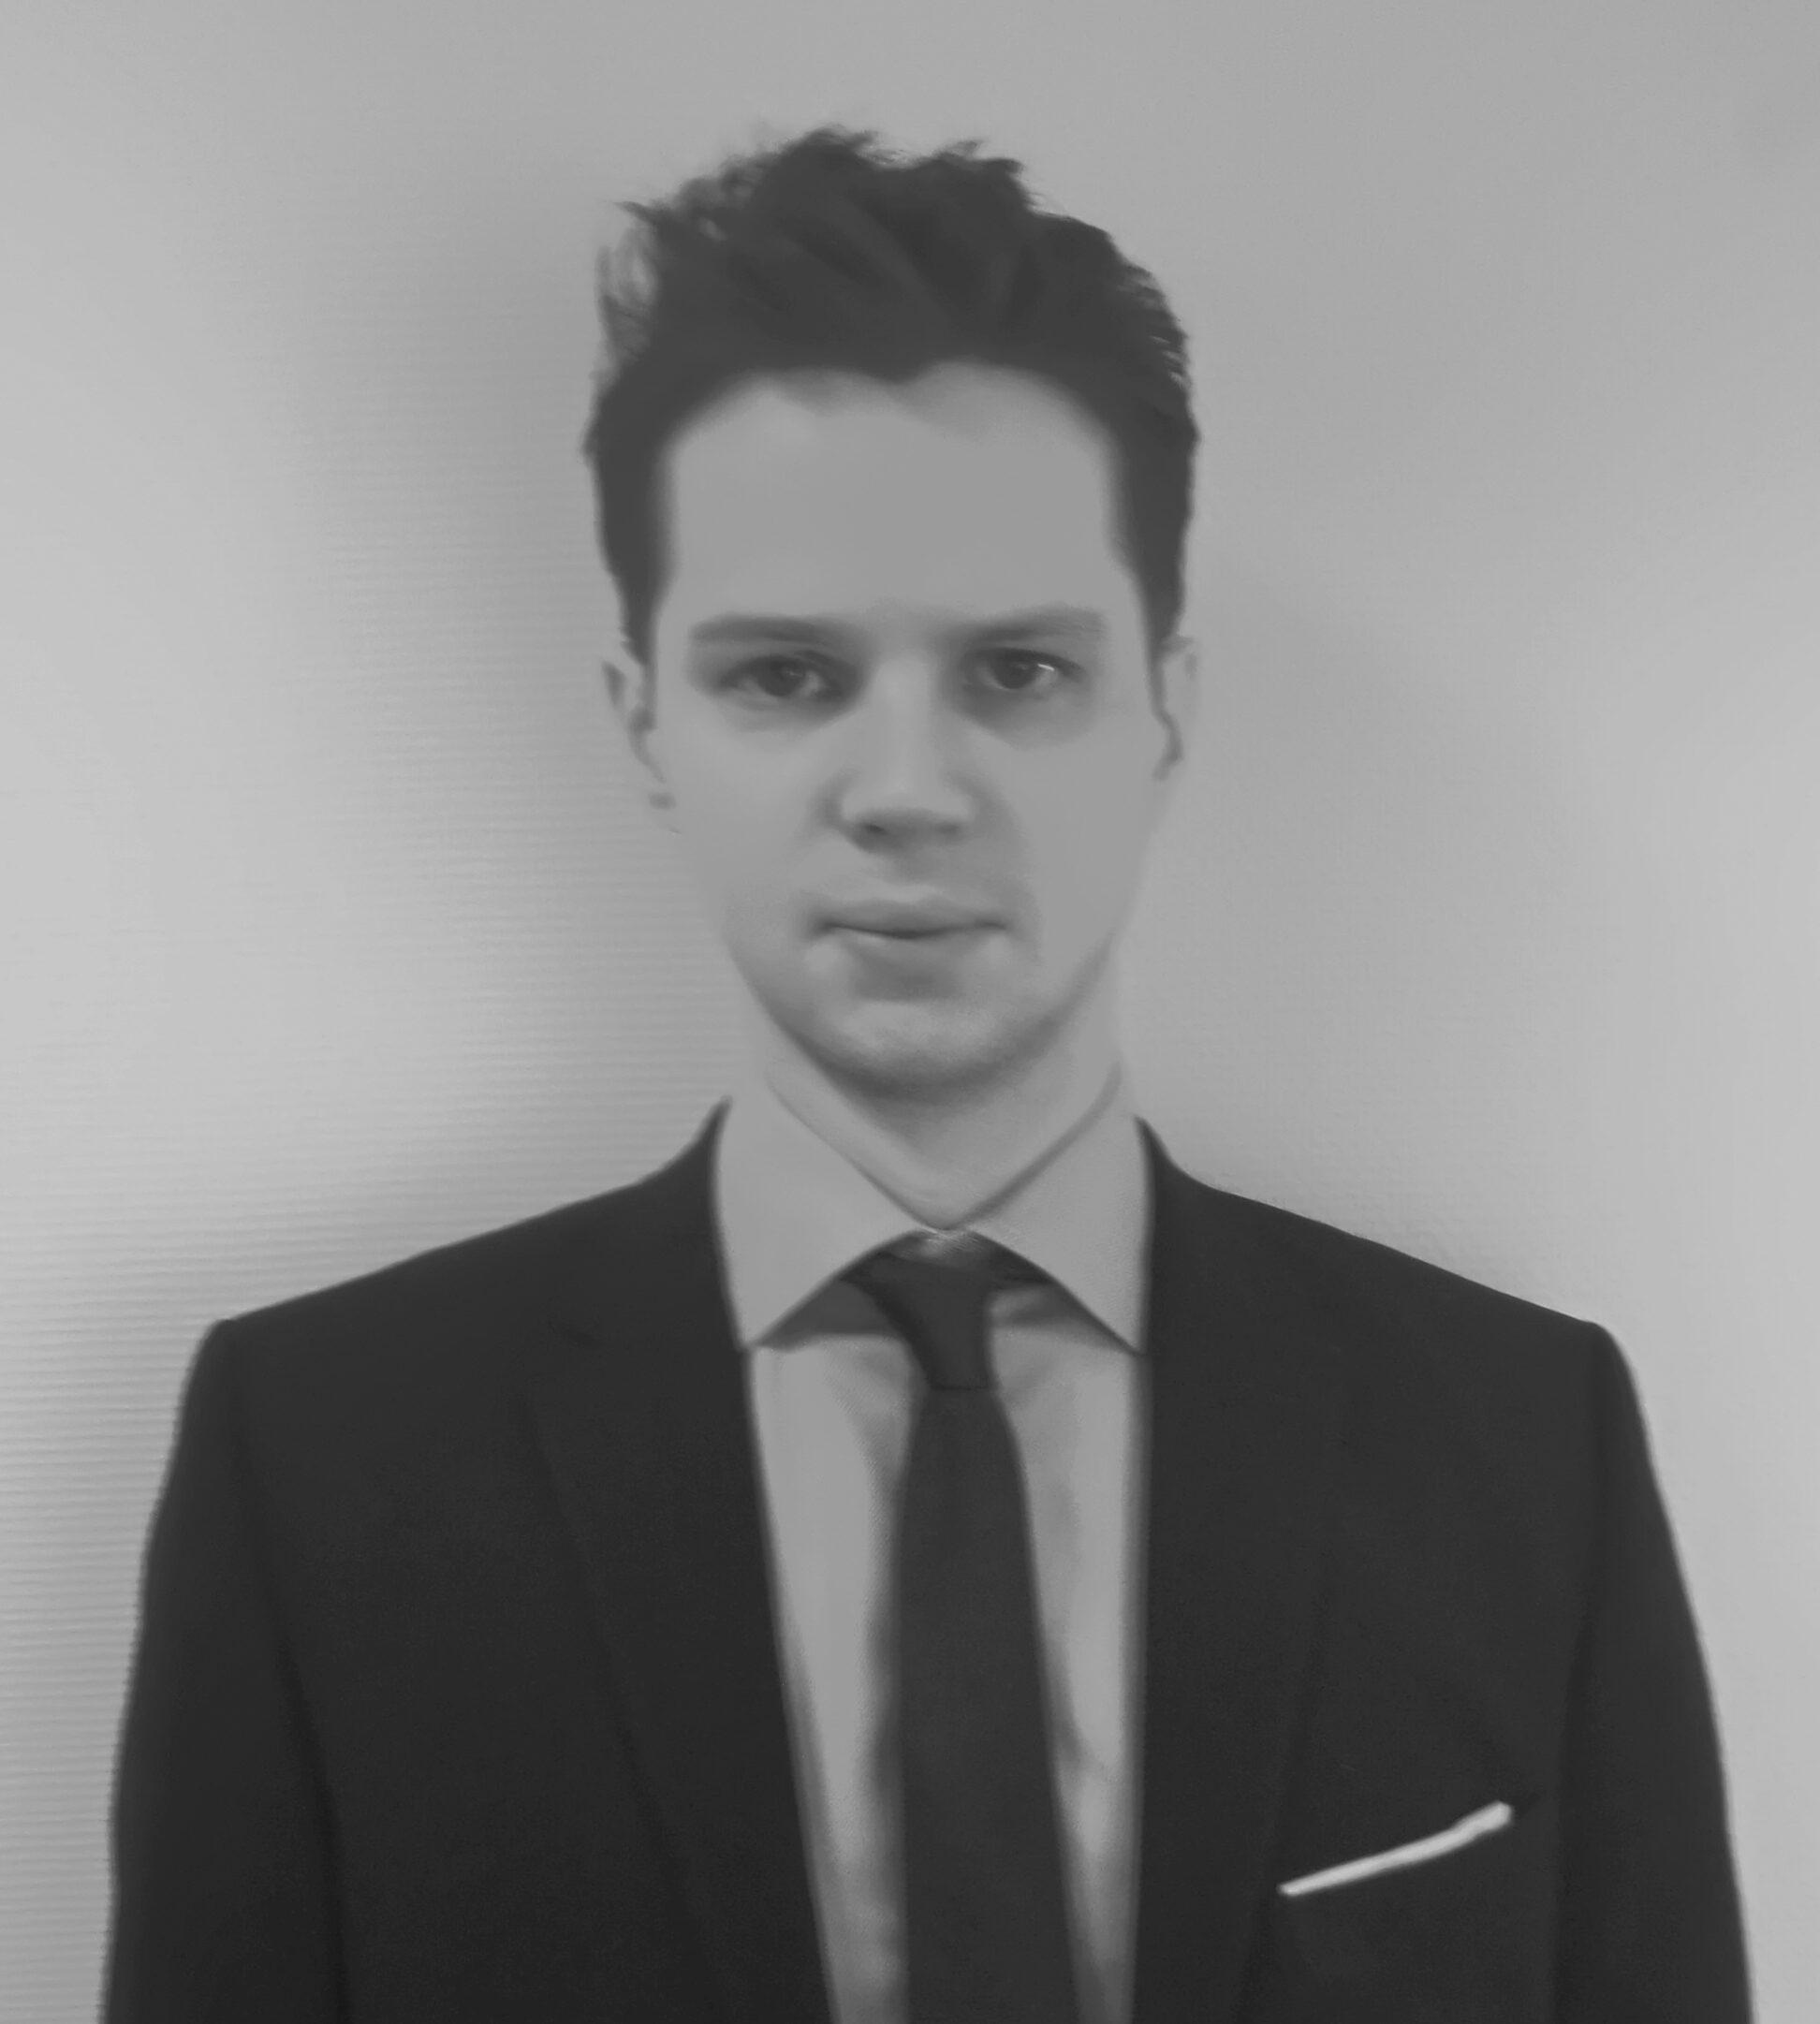 Advokatfullmektig Christian Lohne Aanes